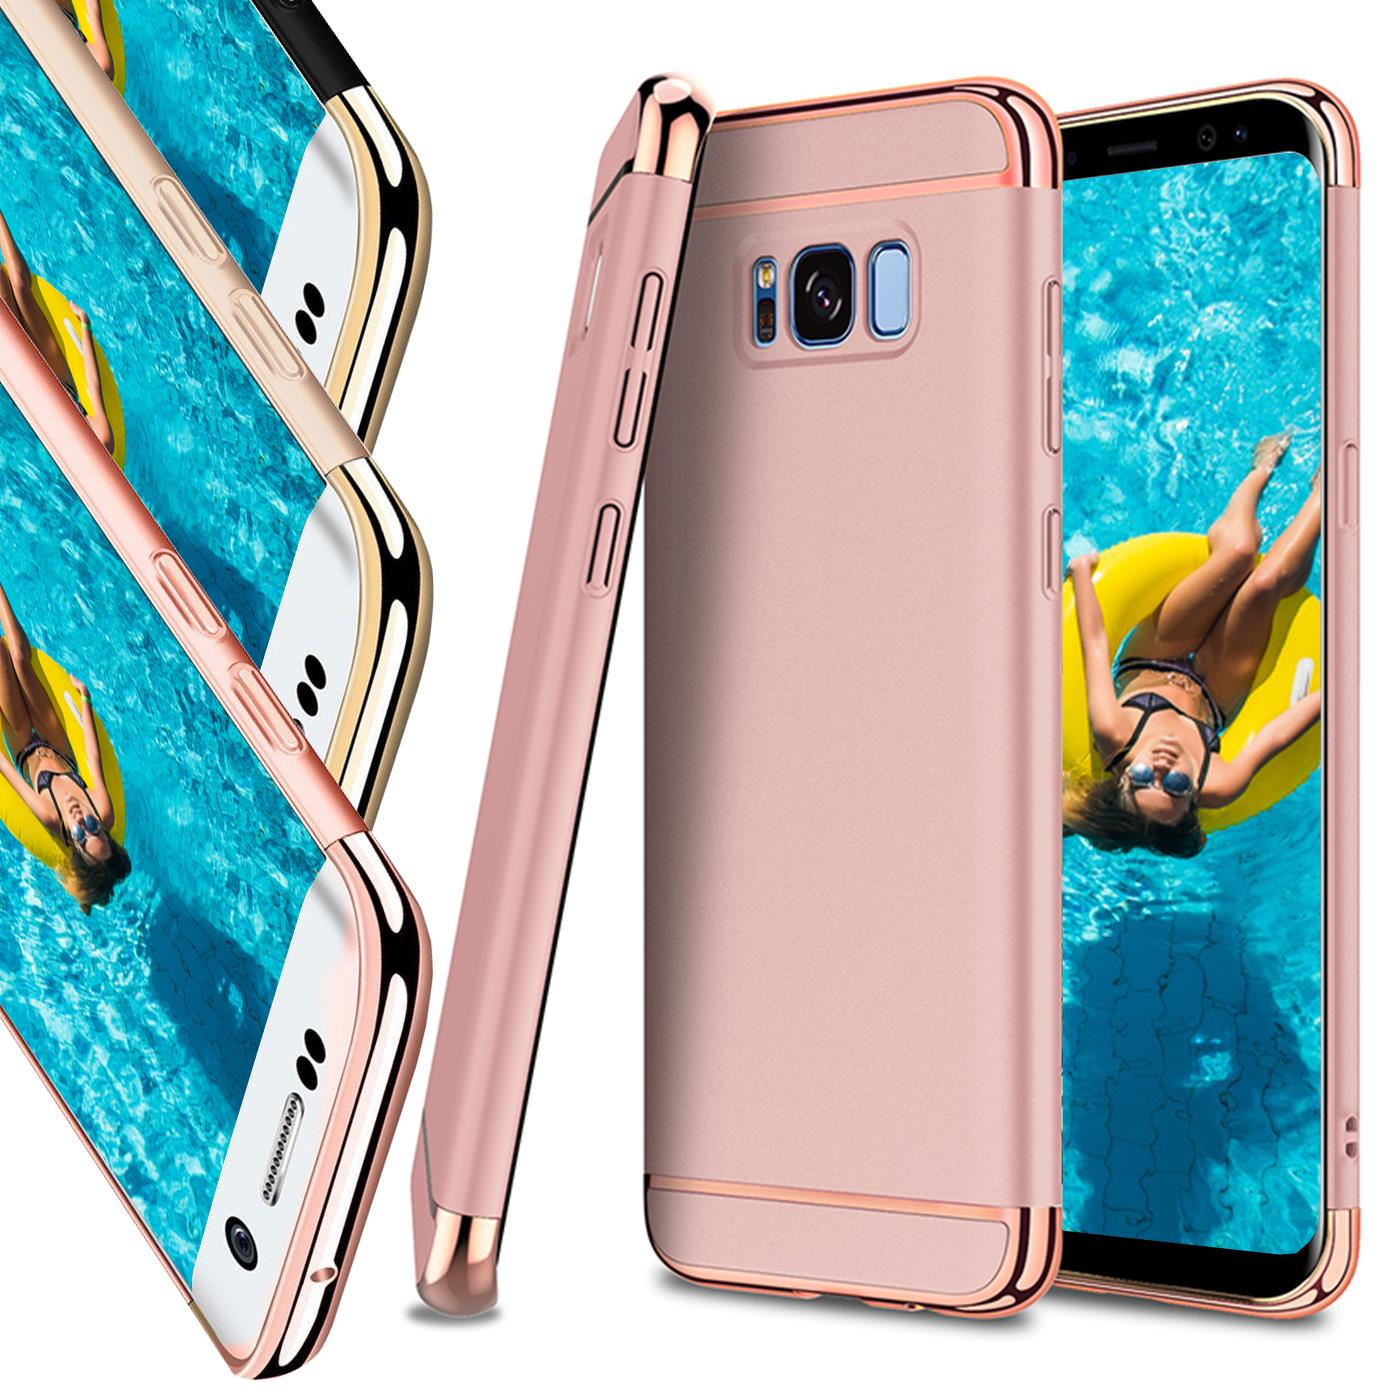 Samsung-Galaxy-S8-Hard-Back-Case-Cover-Thin-Bumper-Slim-Shockproof-Rugged-Thin